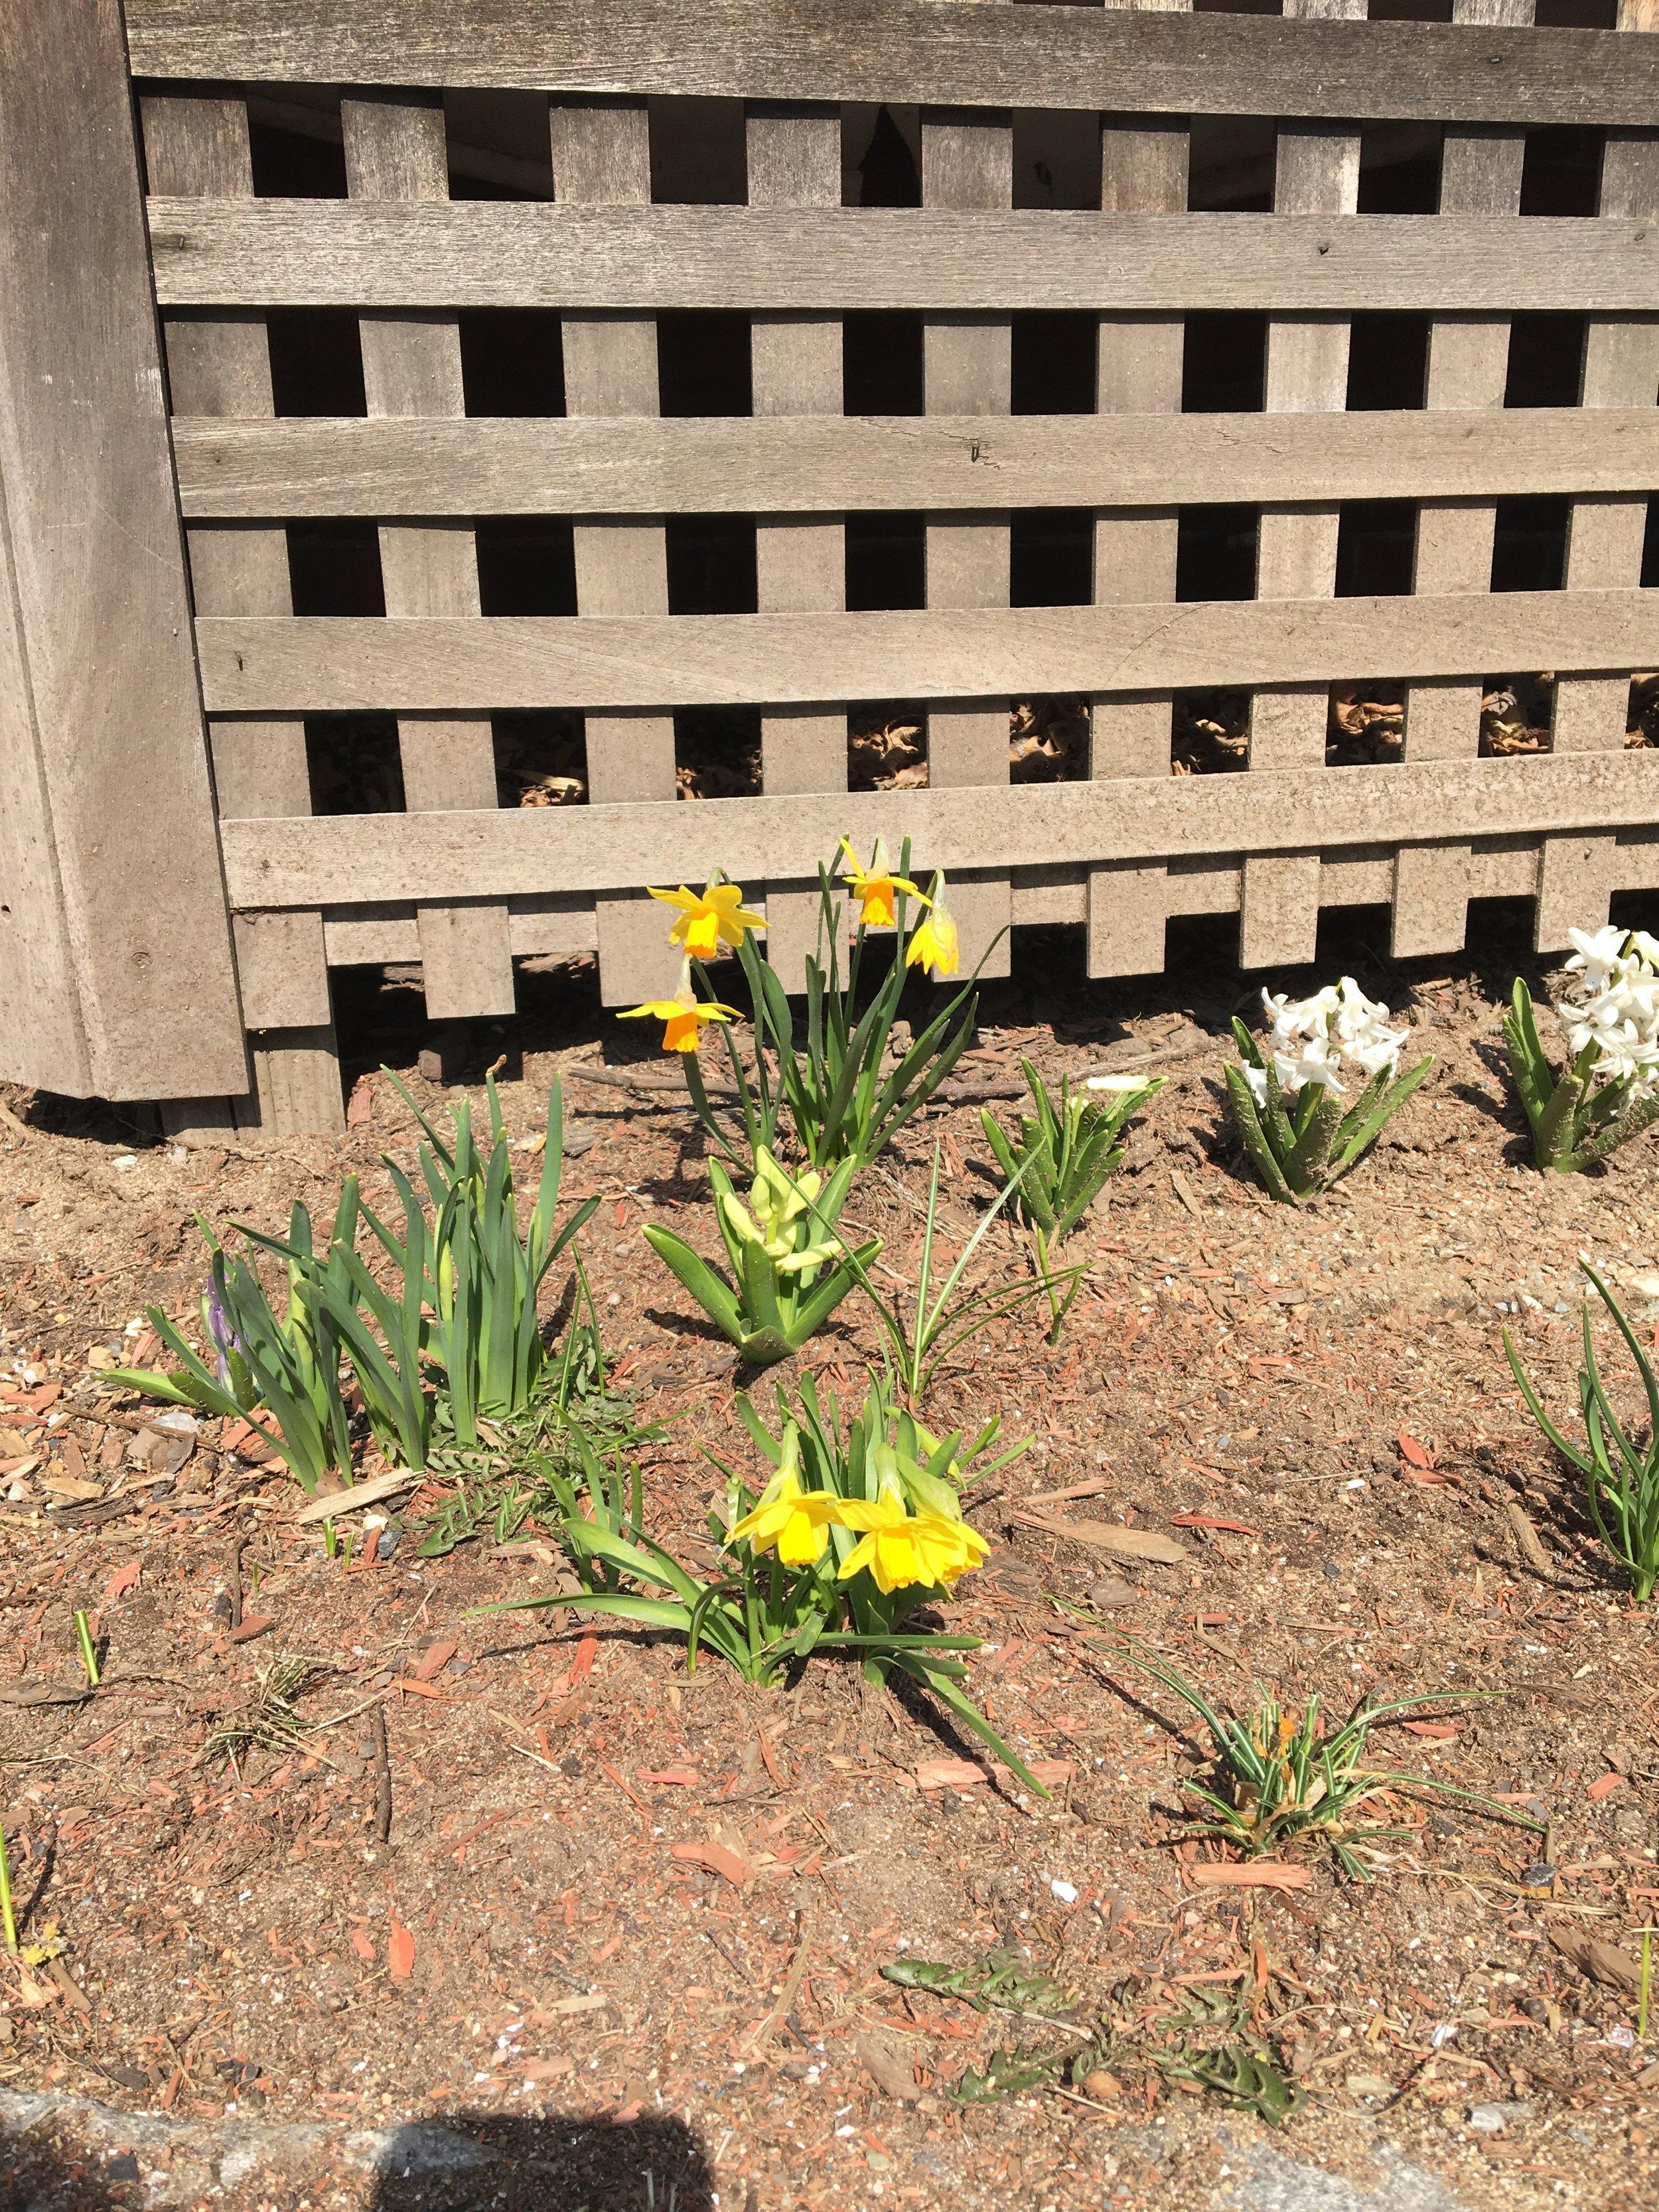 Photo Apr 12, 10 42 10 AM.jpg